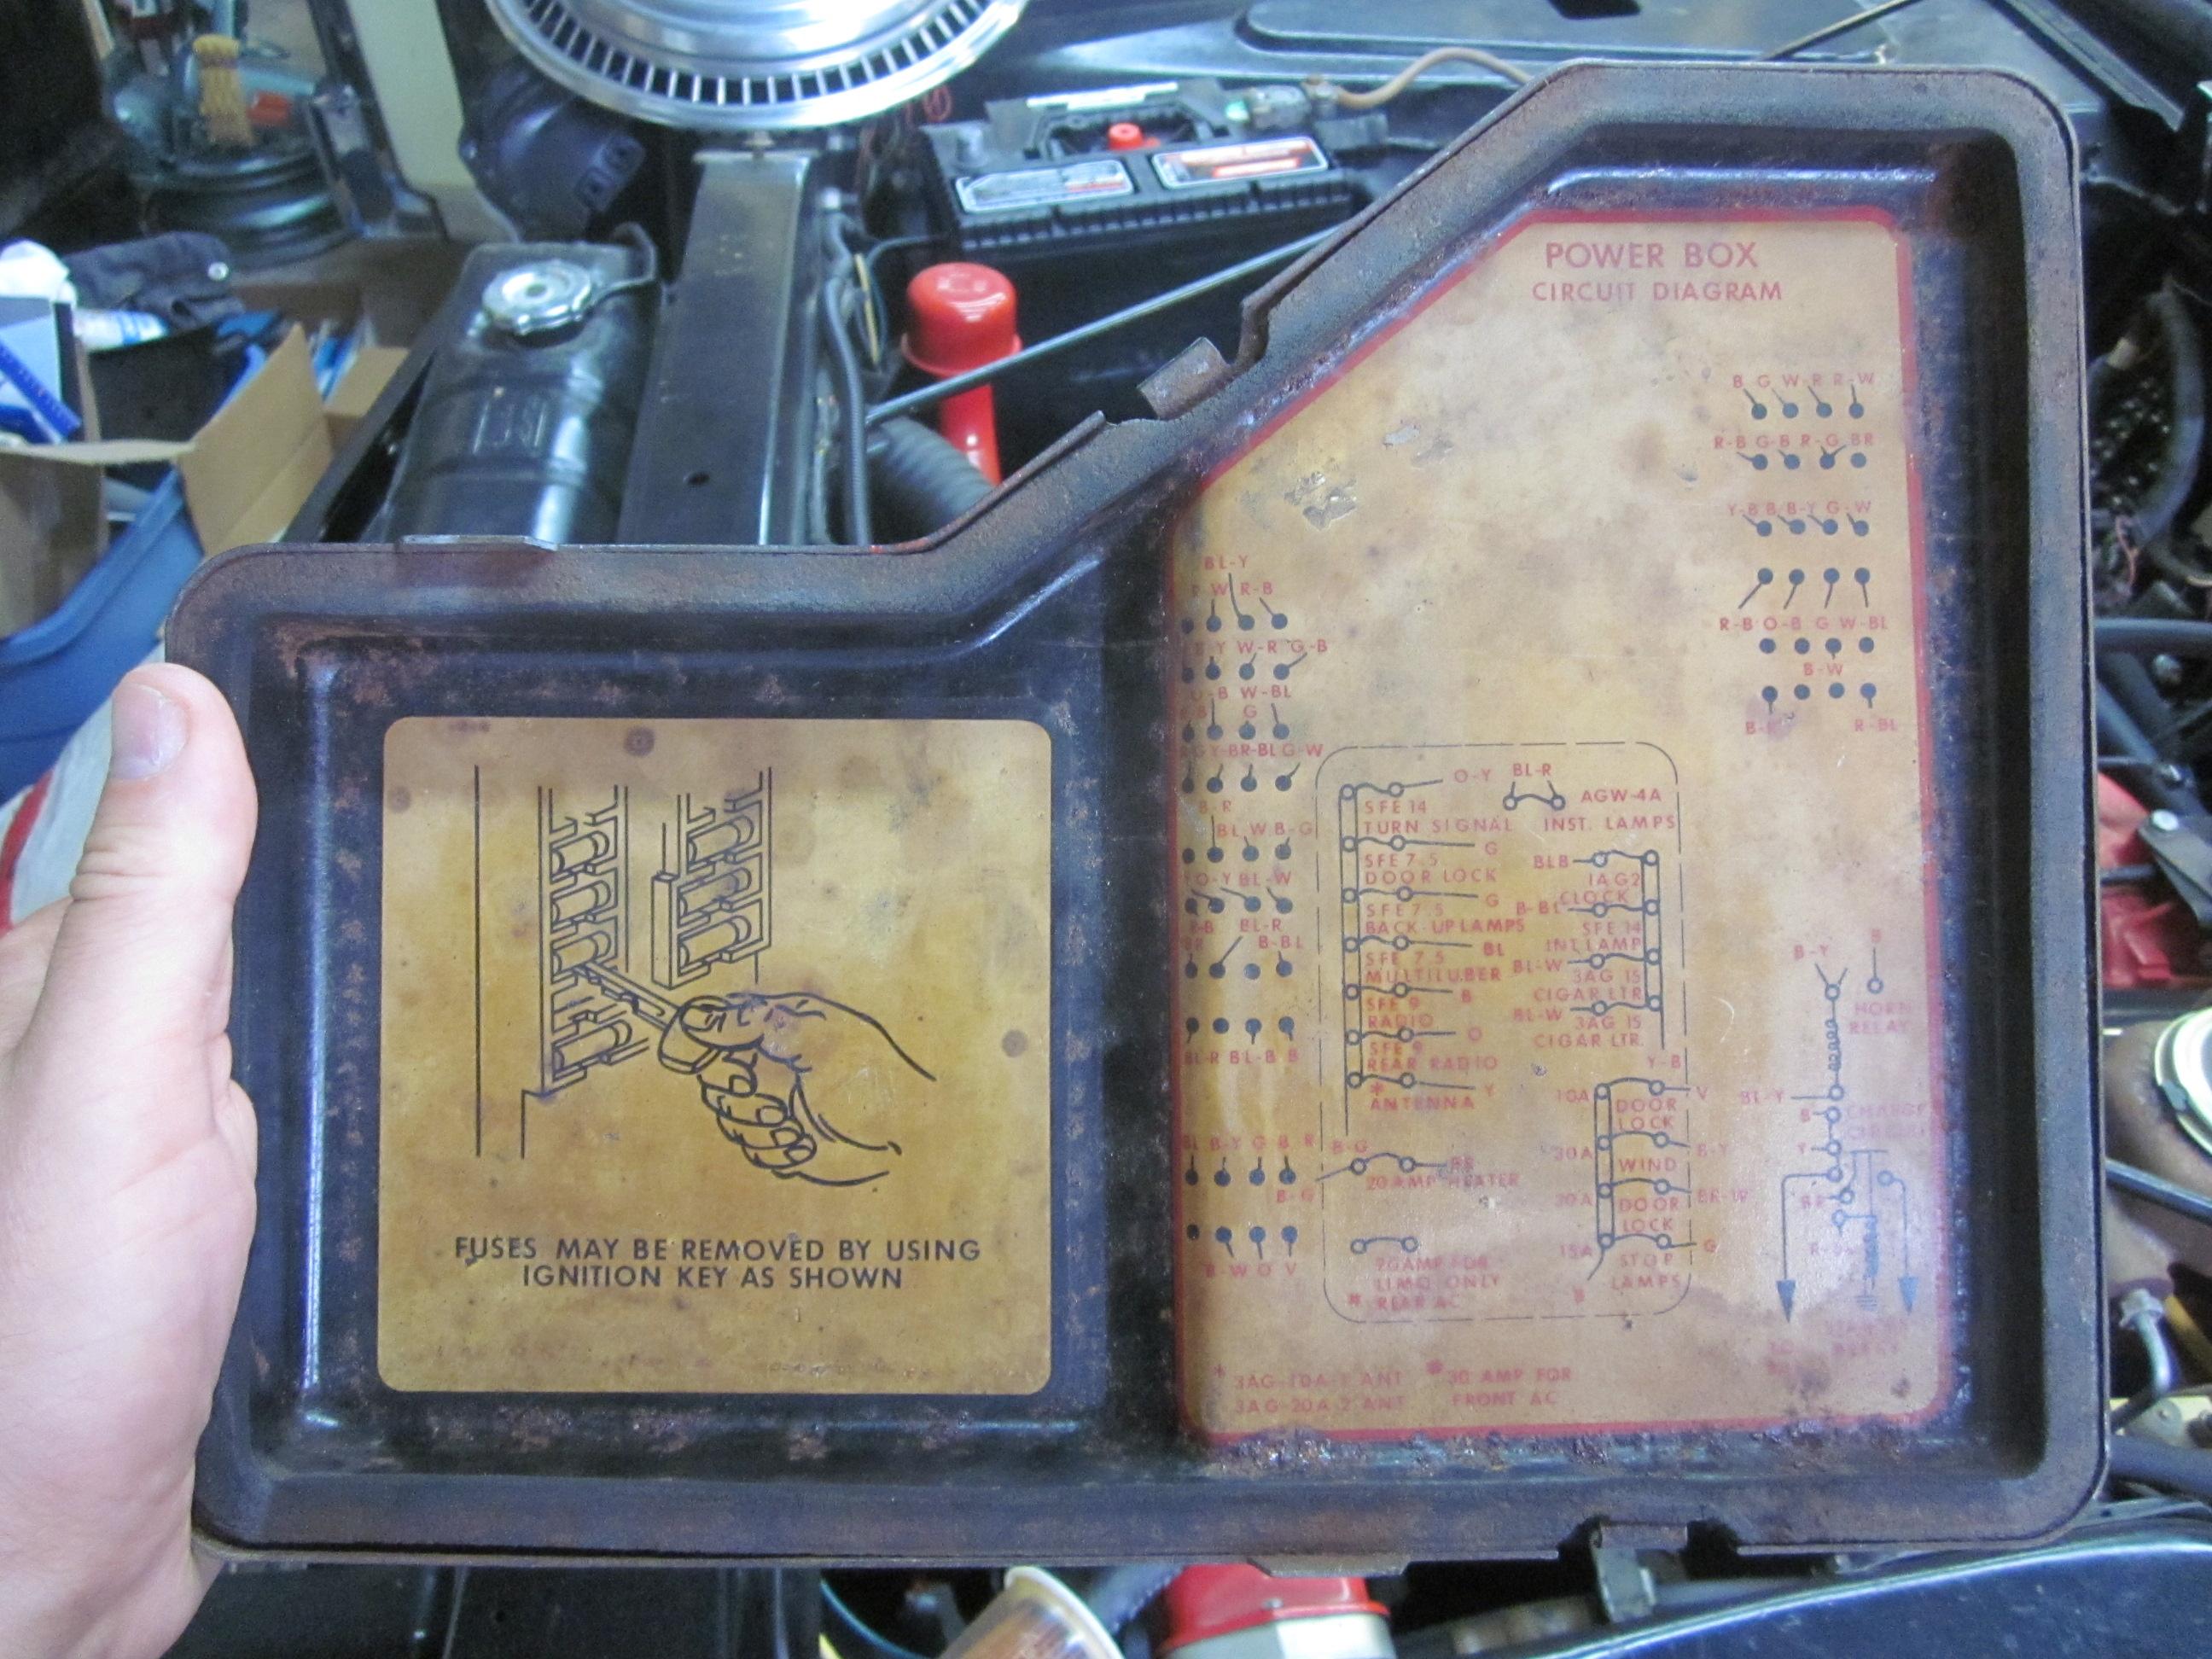 medium resolution of lincoln fuse box diagram lincolnrestoration 1998 cadillac coupe deville fuse diagram 1987 cadillac deville fuse box